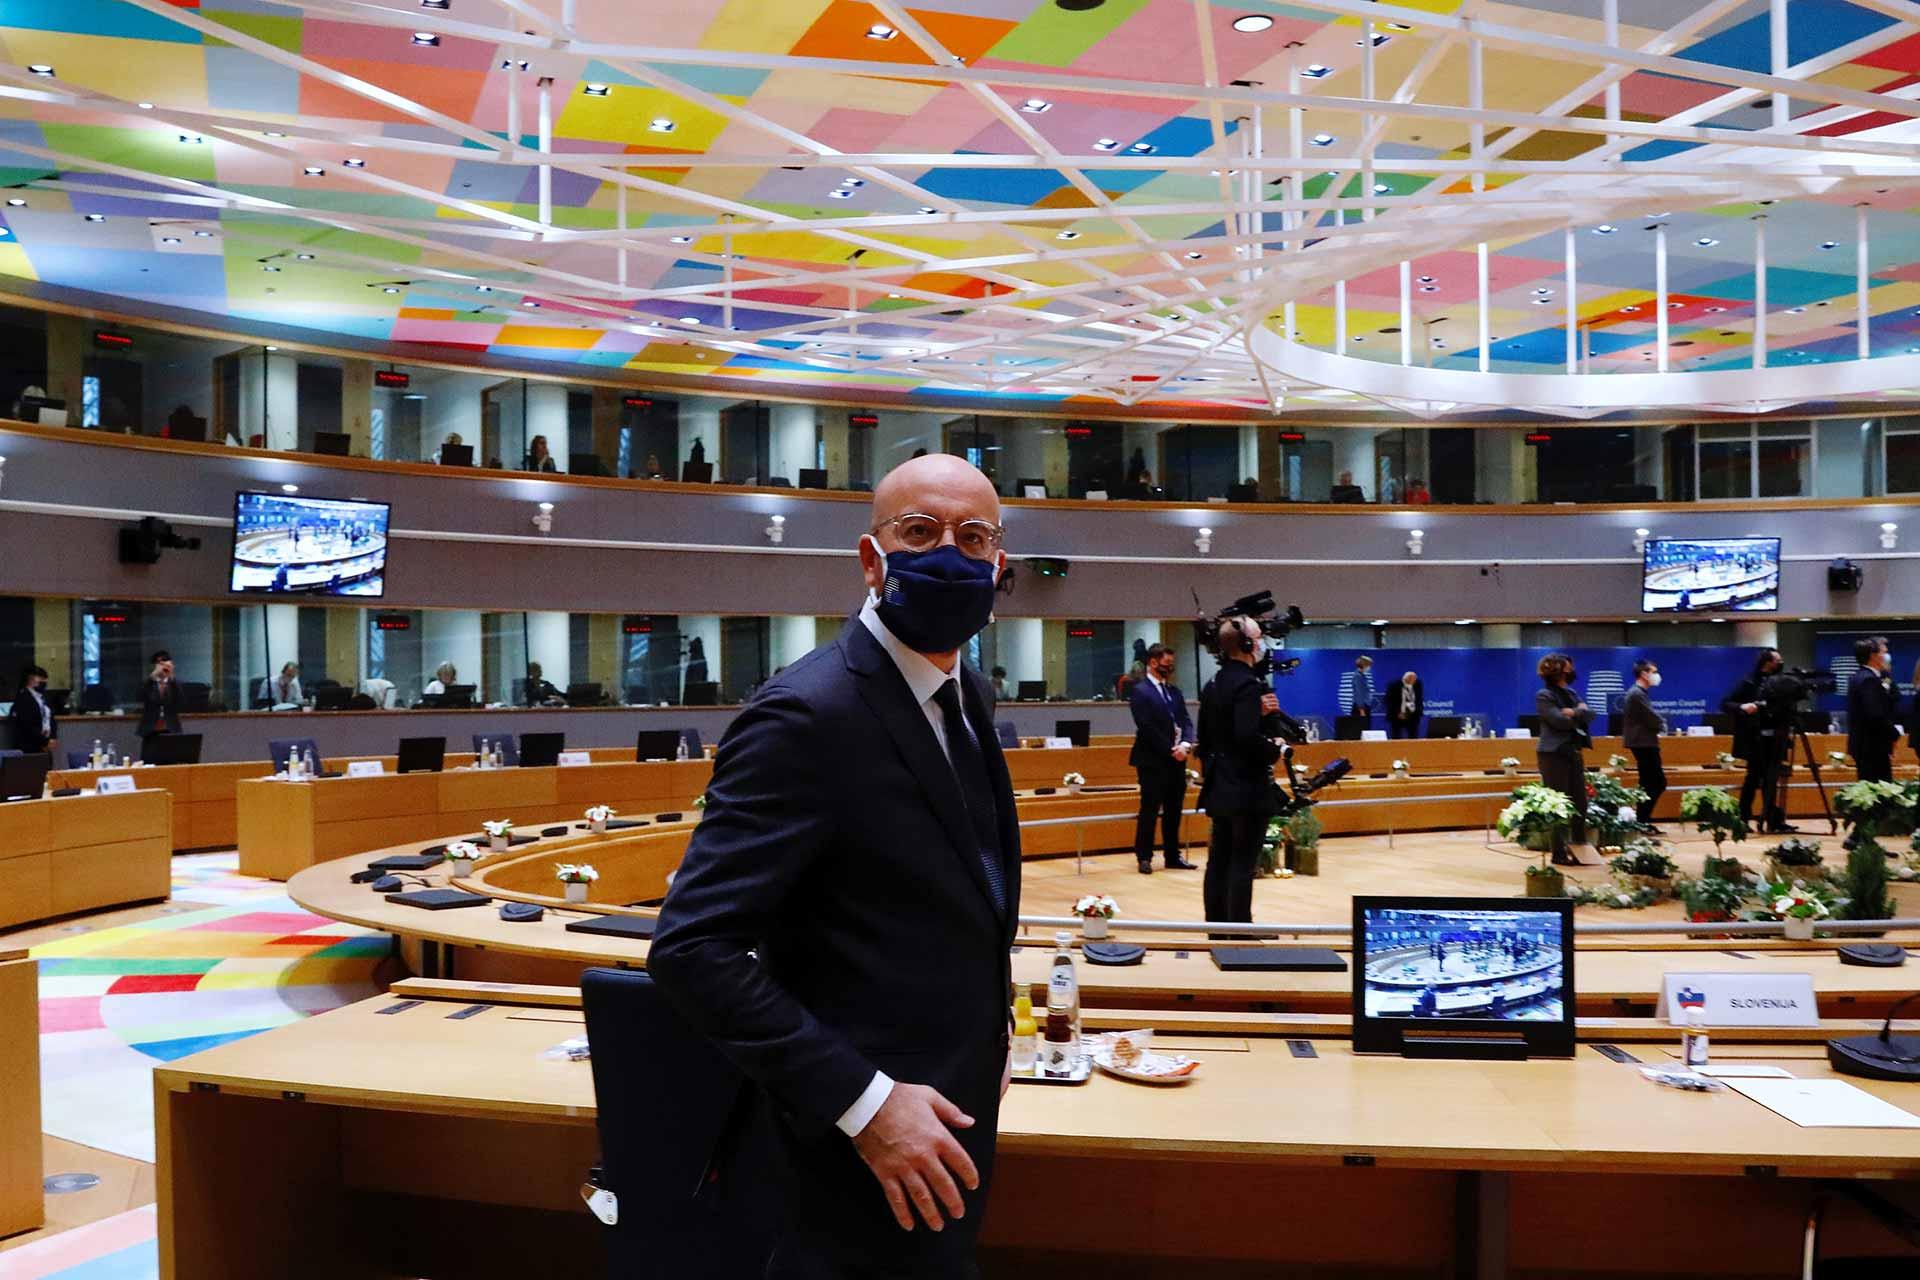 EU Summit - European Council, 10-11 December 2020